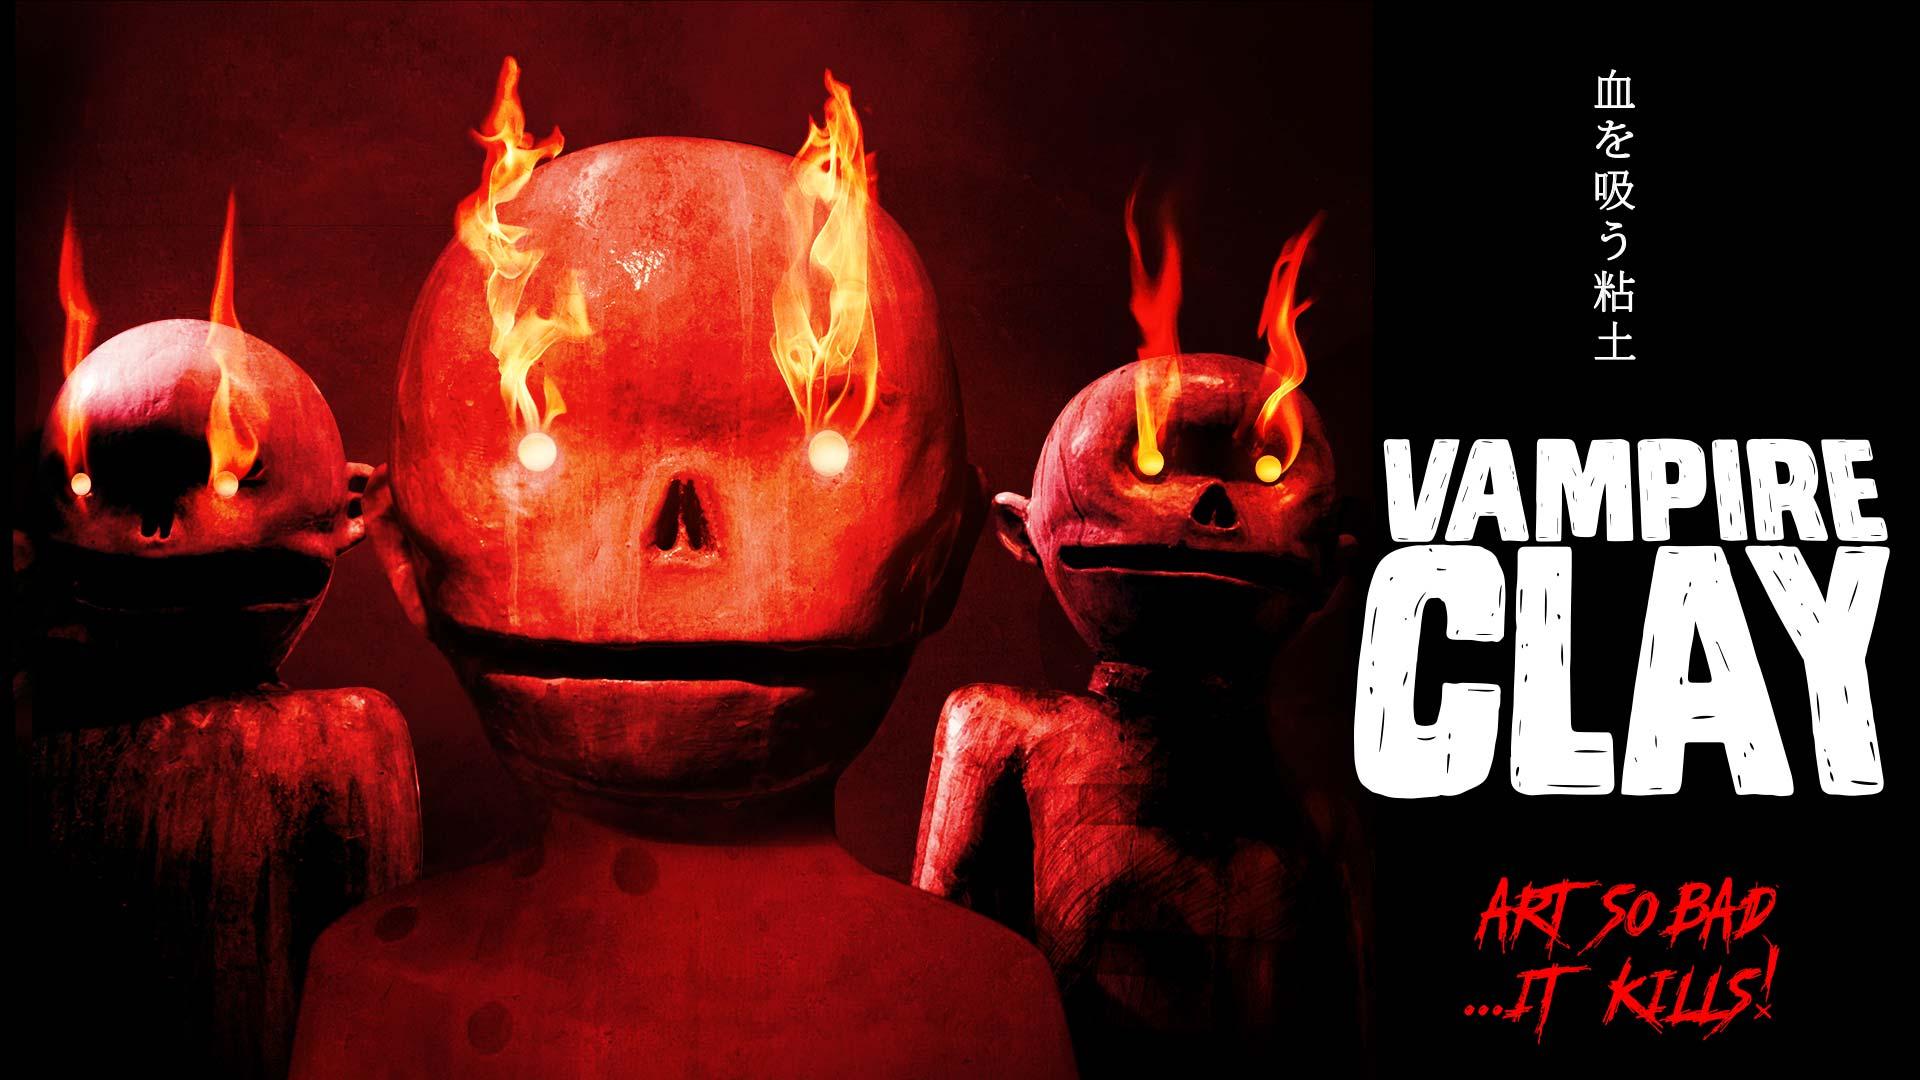 Vampire Clay - image